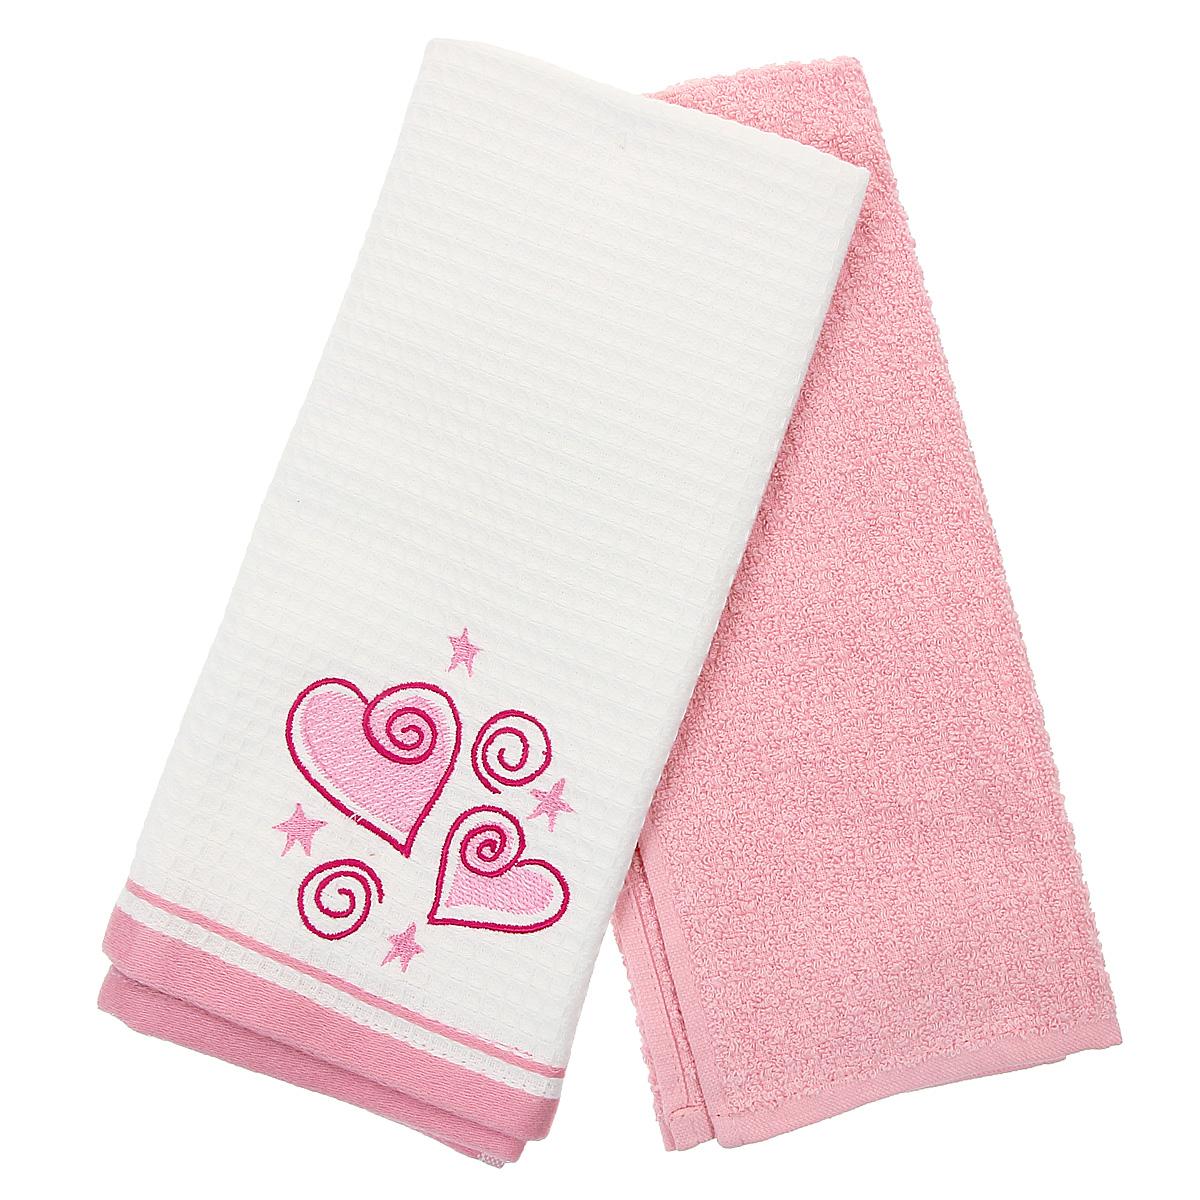 Набор кухонных полотенец Coronet Сердечки, цвет: белый, розовый, 40 см х 60 см, 2 штК-МП-5010-05-02-03